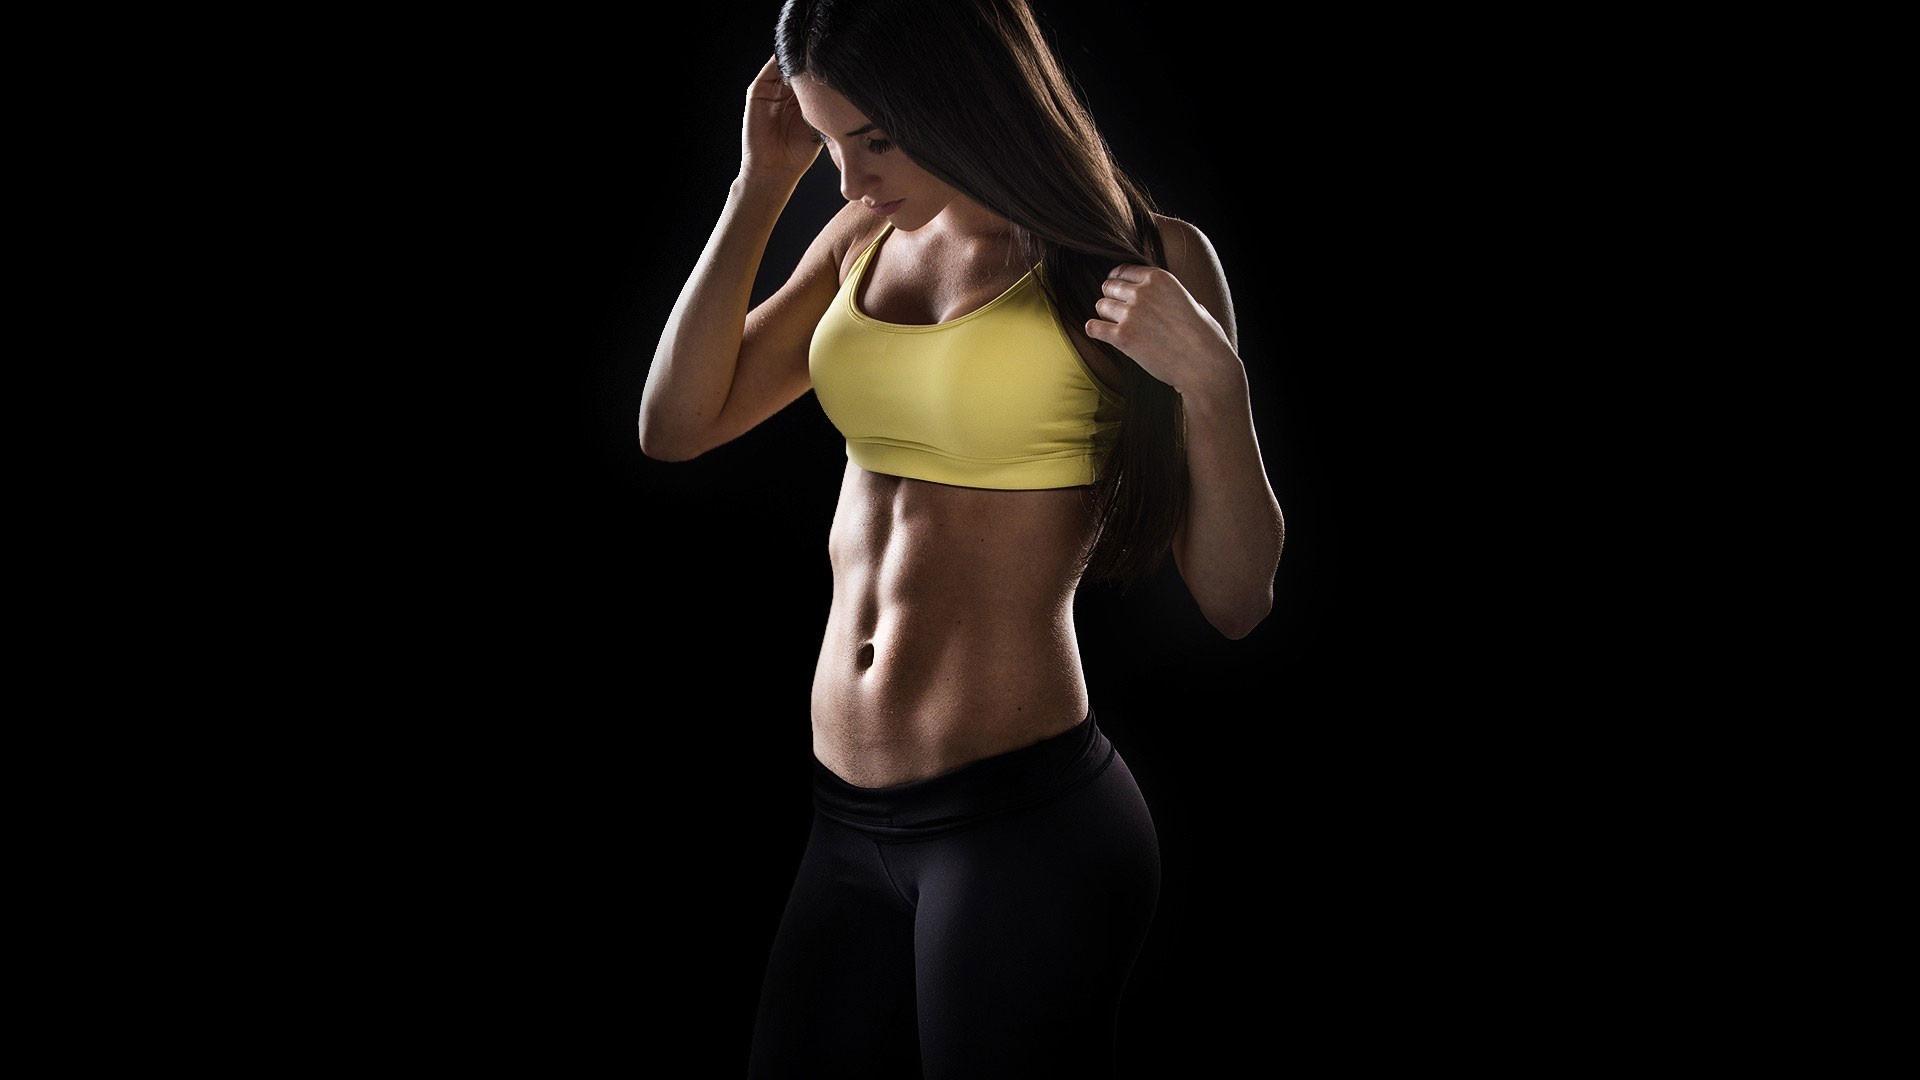 hd pics photos best female girl fitness workout hd quality desktop  background wallpaper